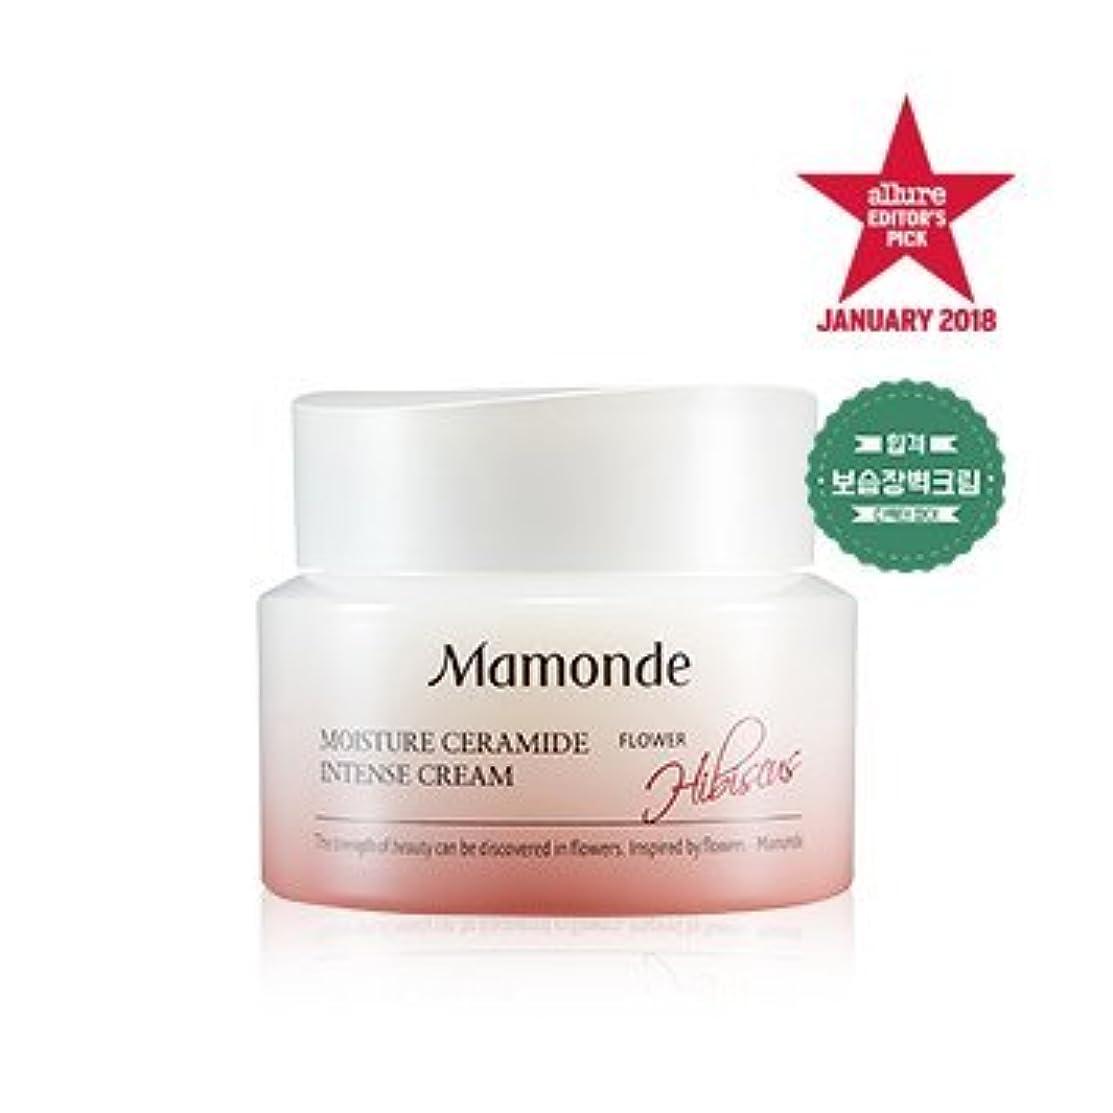 [MAMONDE] モイスチャーセラミドインテンシブクリーム / Moisture Ceramide Intense cream 50ml [並行輸入品]